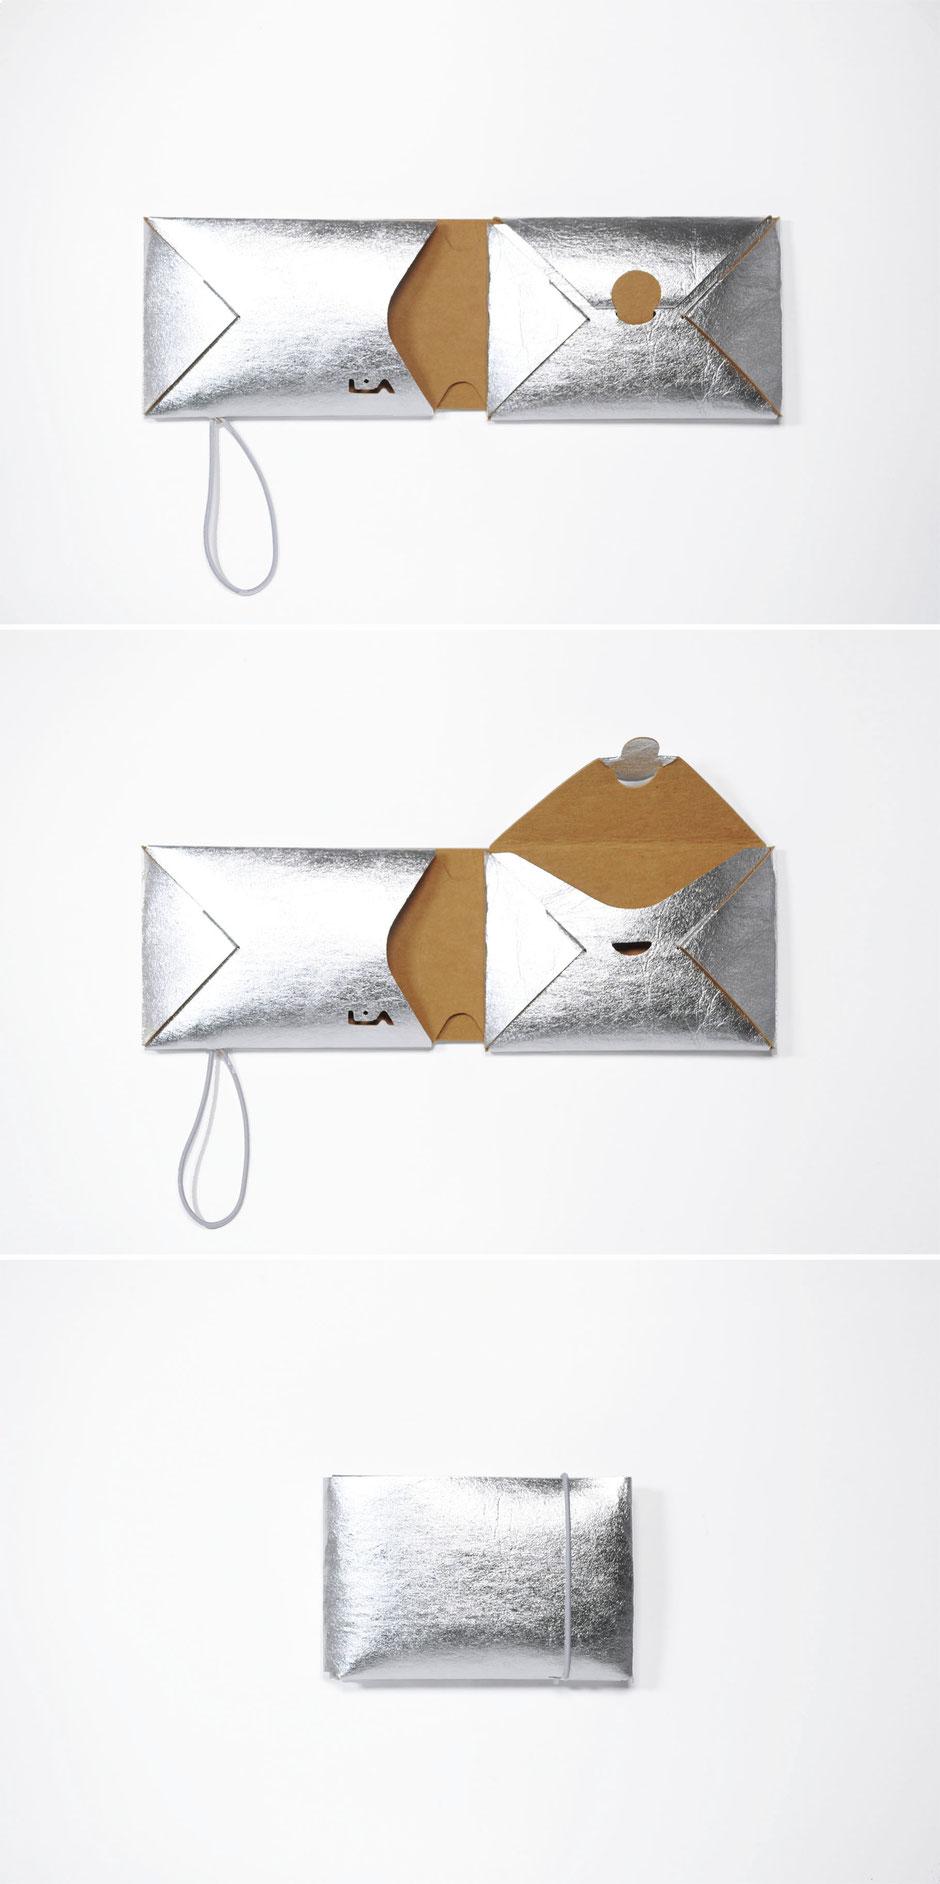 liaform Portemonnaie REM silber | Vegane Mini Origami Geldbörse | vegan mini oriami purse/wallet | Portefeuille Vegan Mini Origami